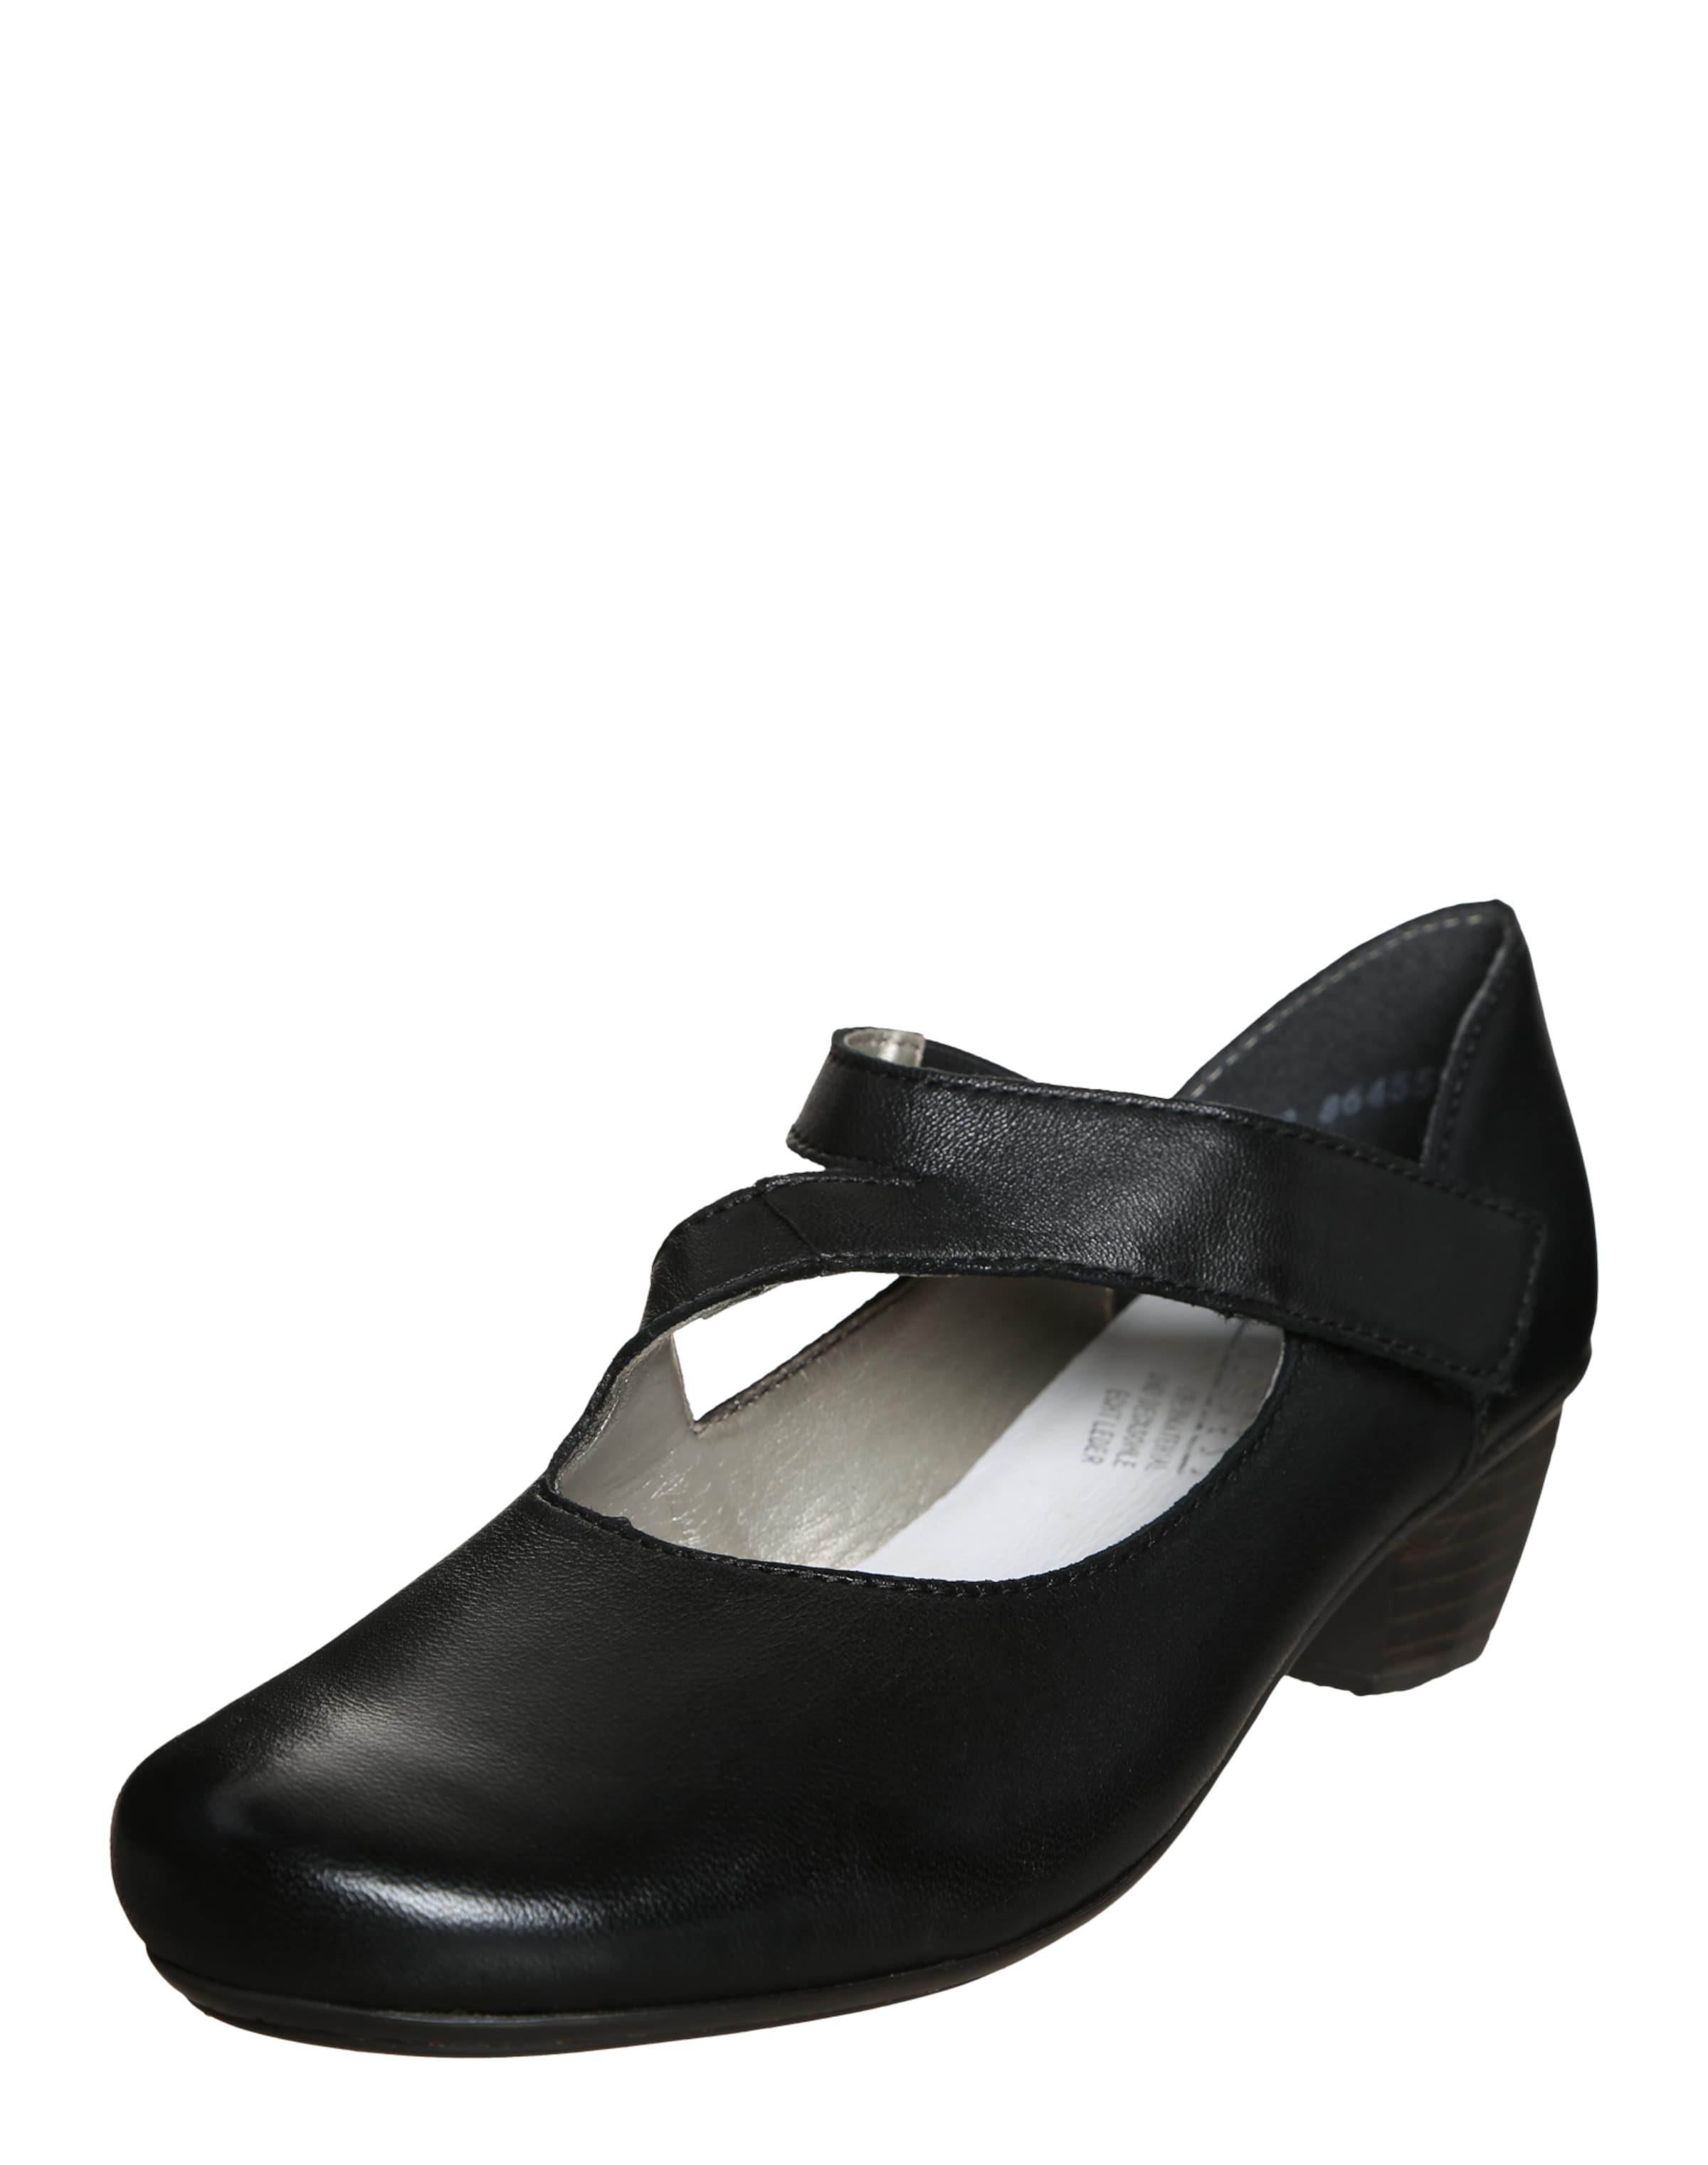 RIEKER Lederpumps Verschleißfeste billige Schuhe Hohe Qualität